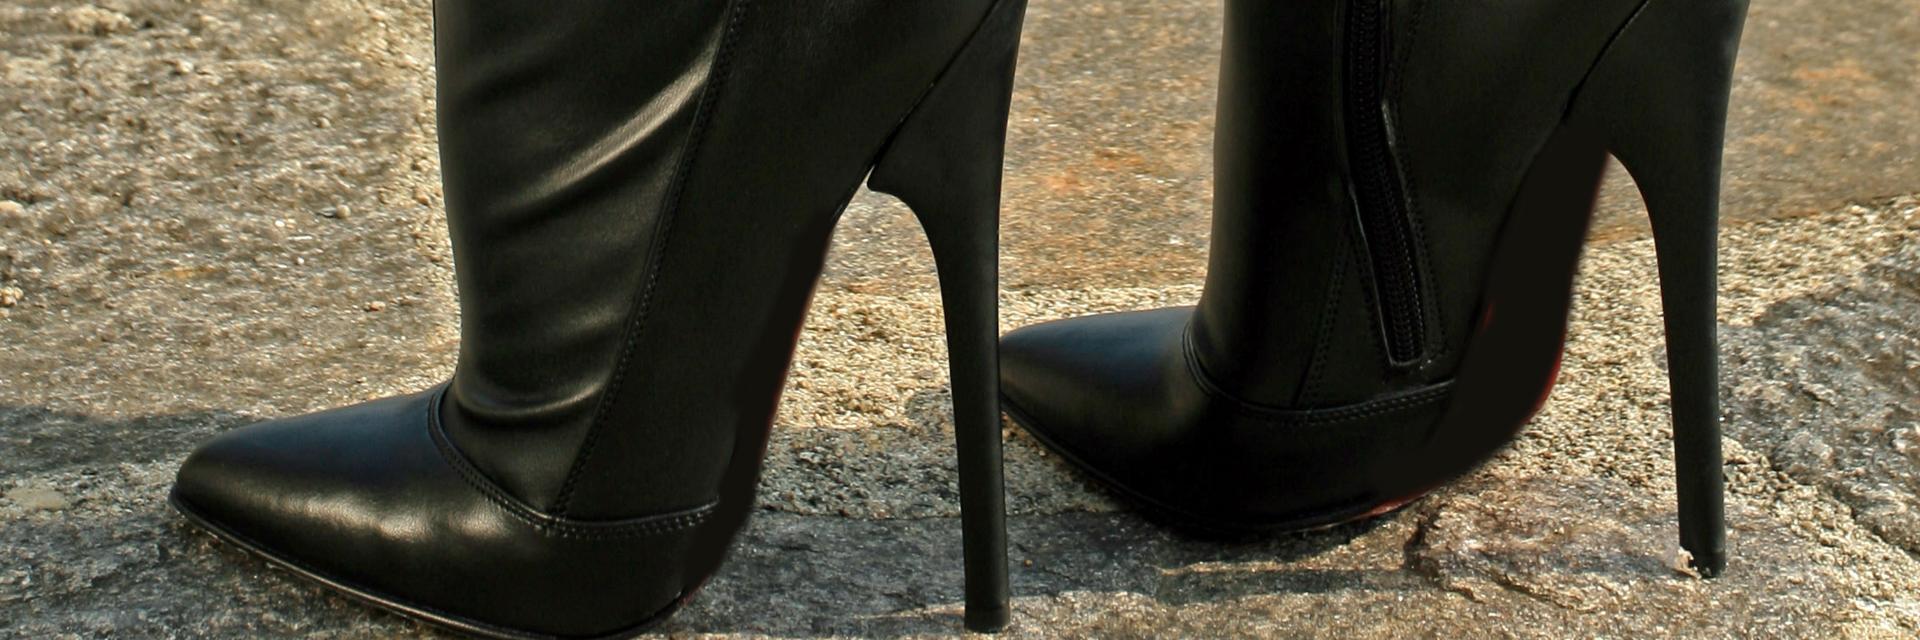 high heels online kaufen damen pumps benetton high heels modische high heels damen sandaletten. Black Bedroom Furniture Sets. Home Design Ideas